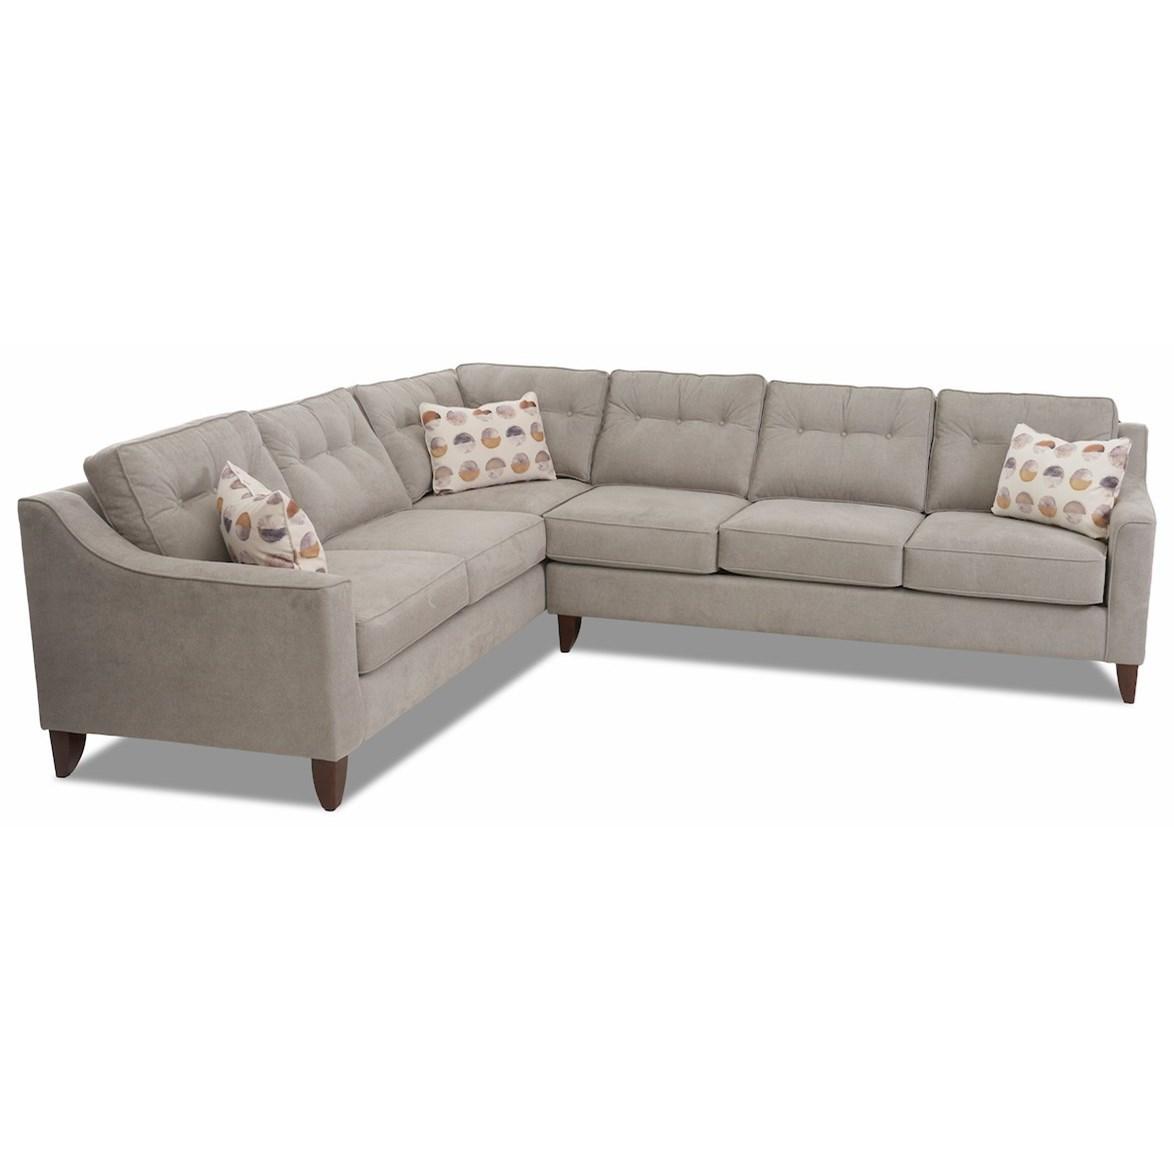 Mid Century Modern  2-Piece Sectional Sofa w/ LAF Corner Sofa